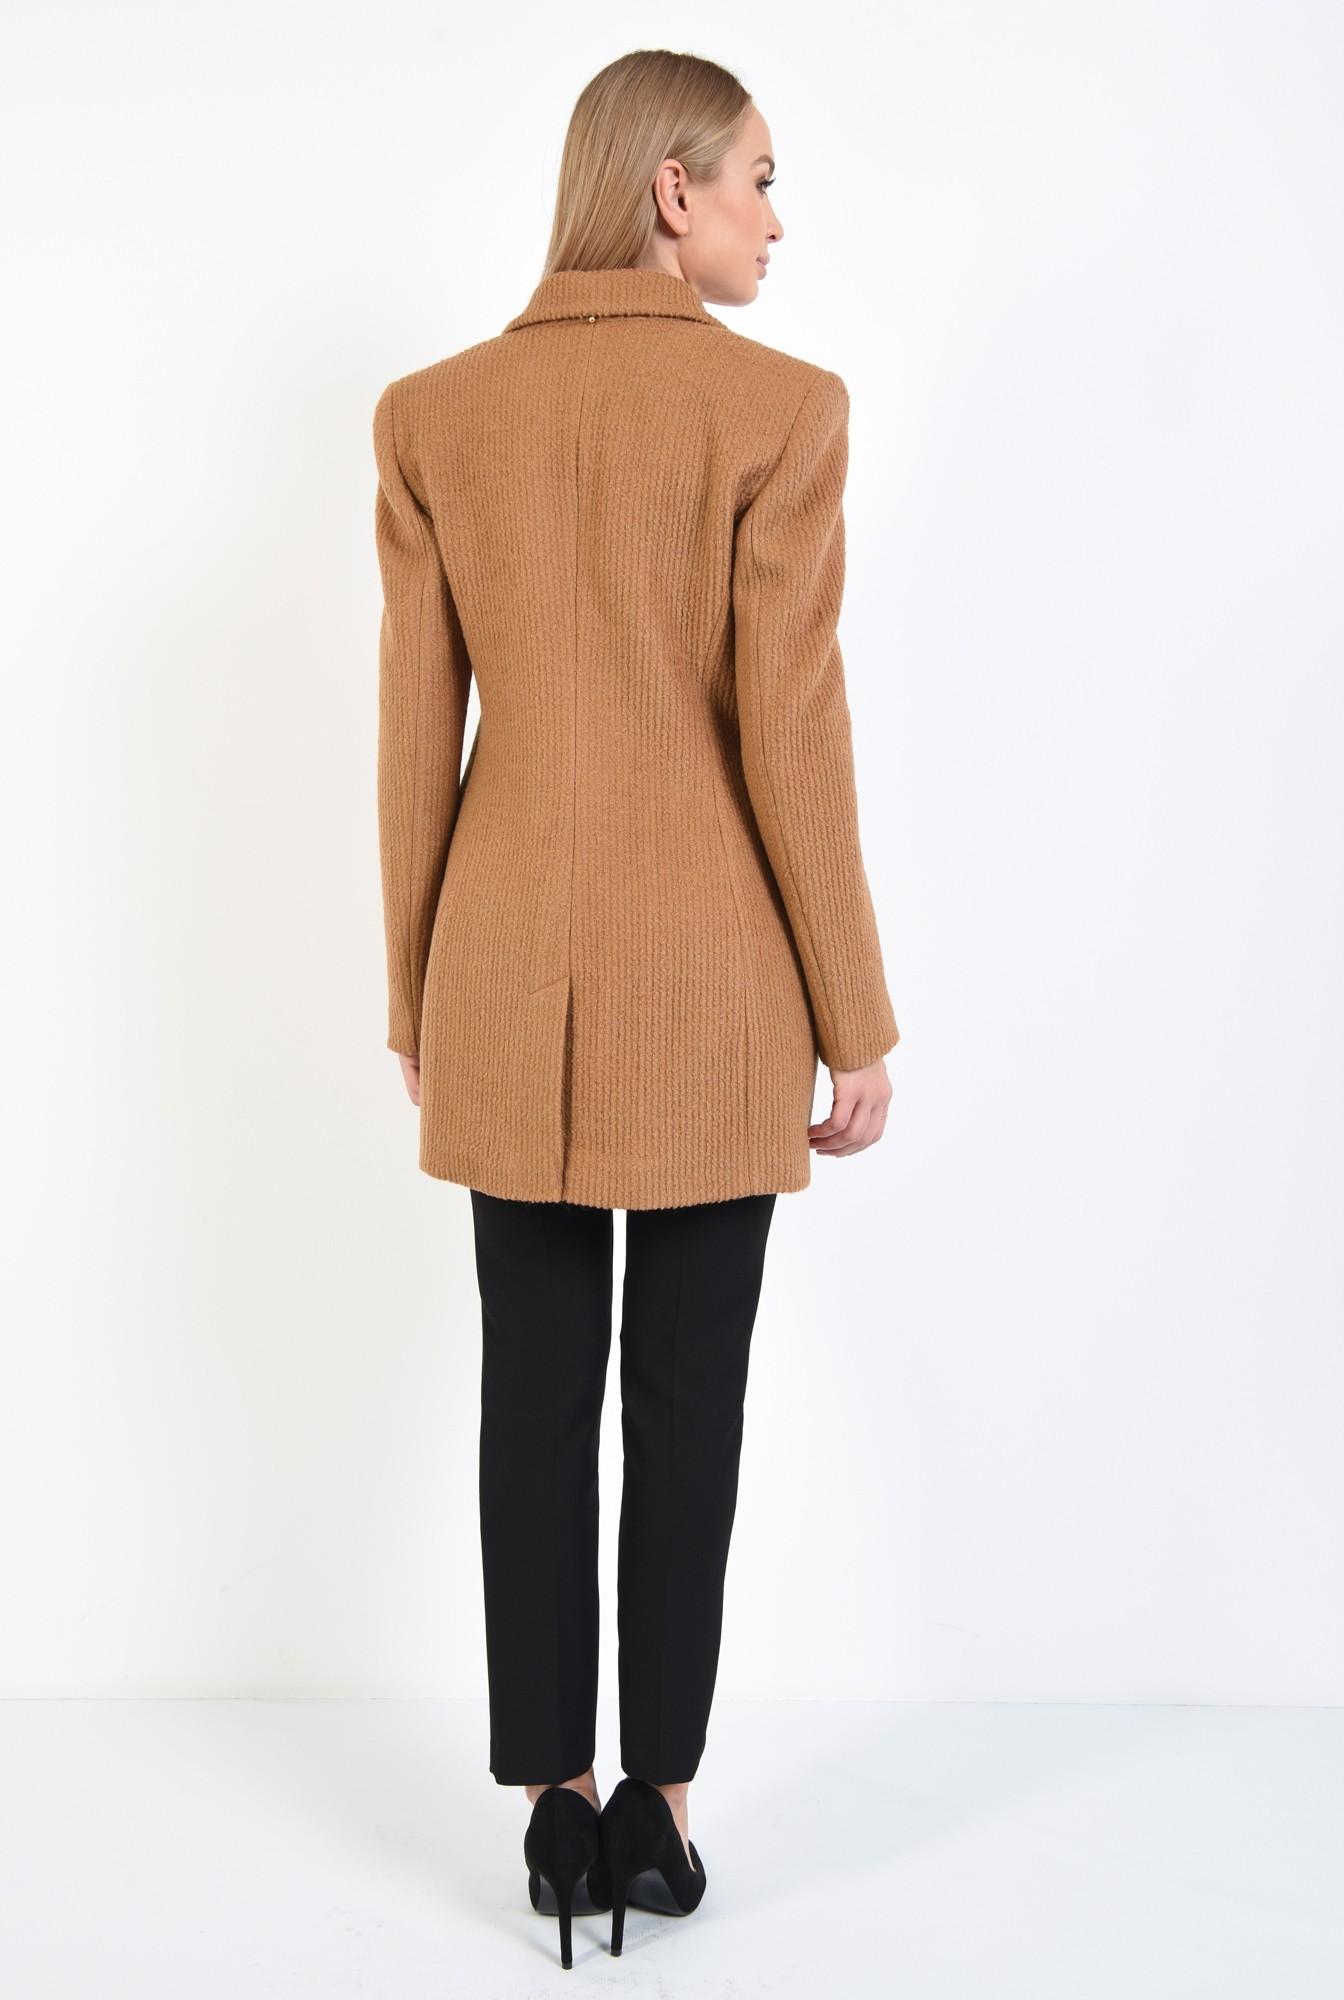 1 - palton scurt, revere crestate, doua randuri de nasturi